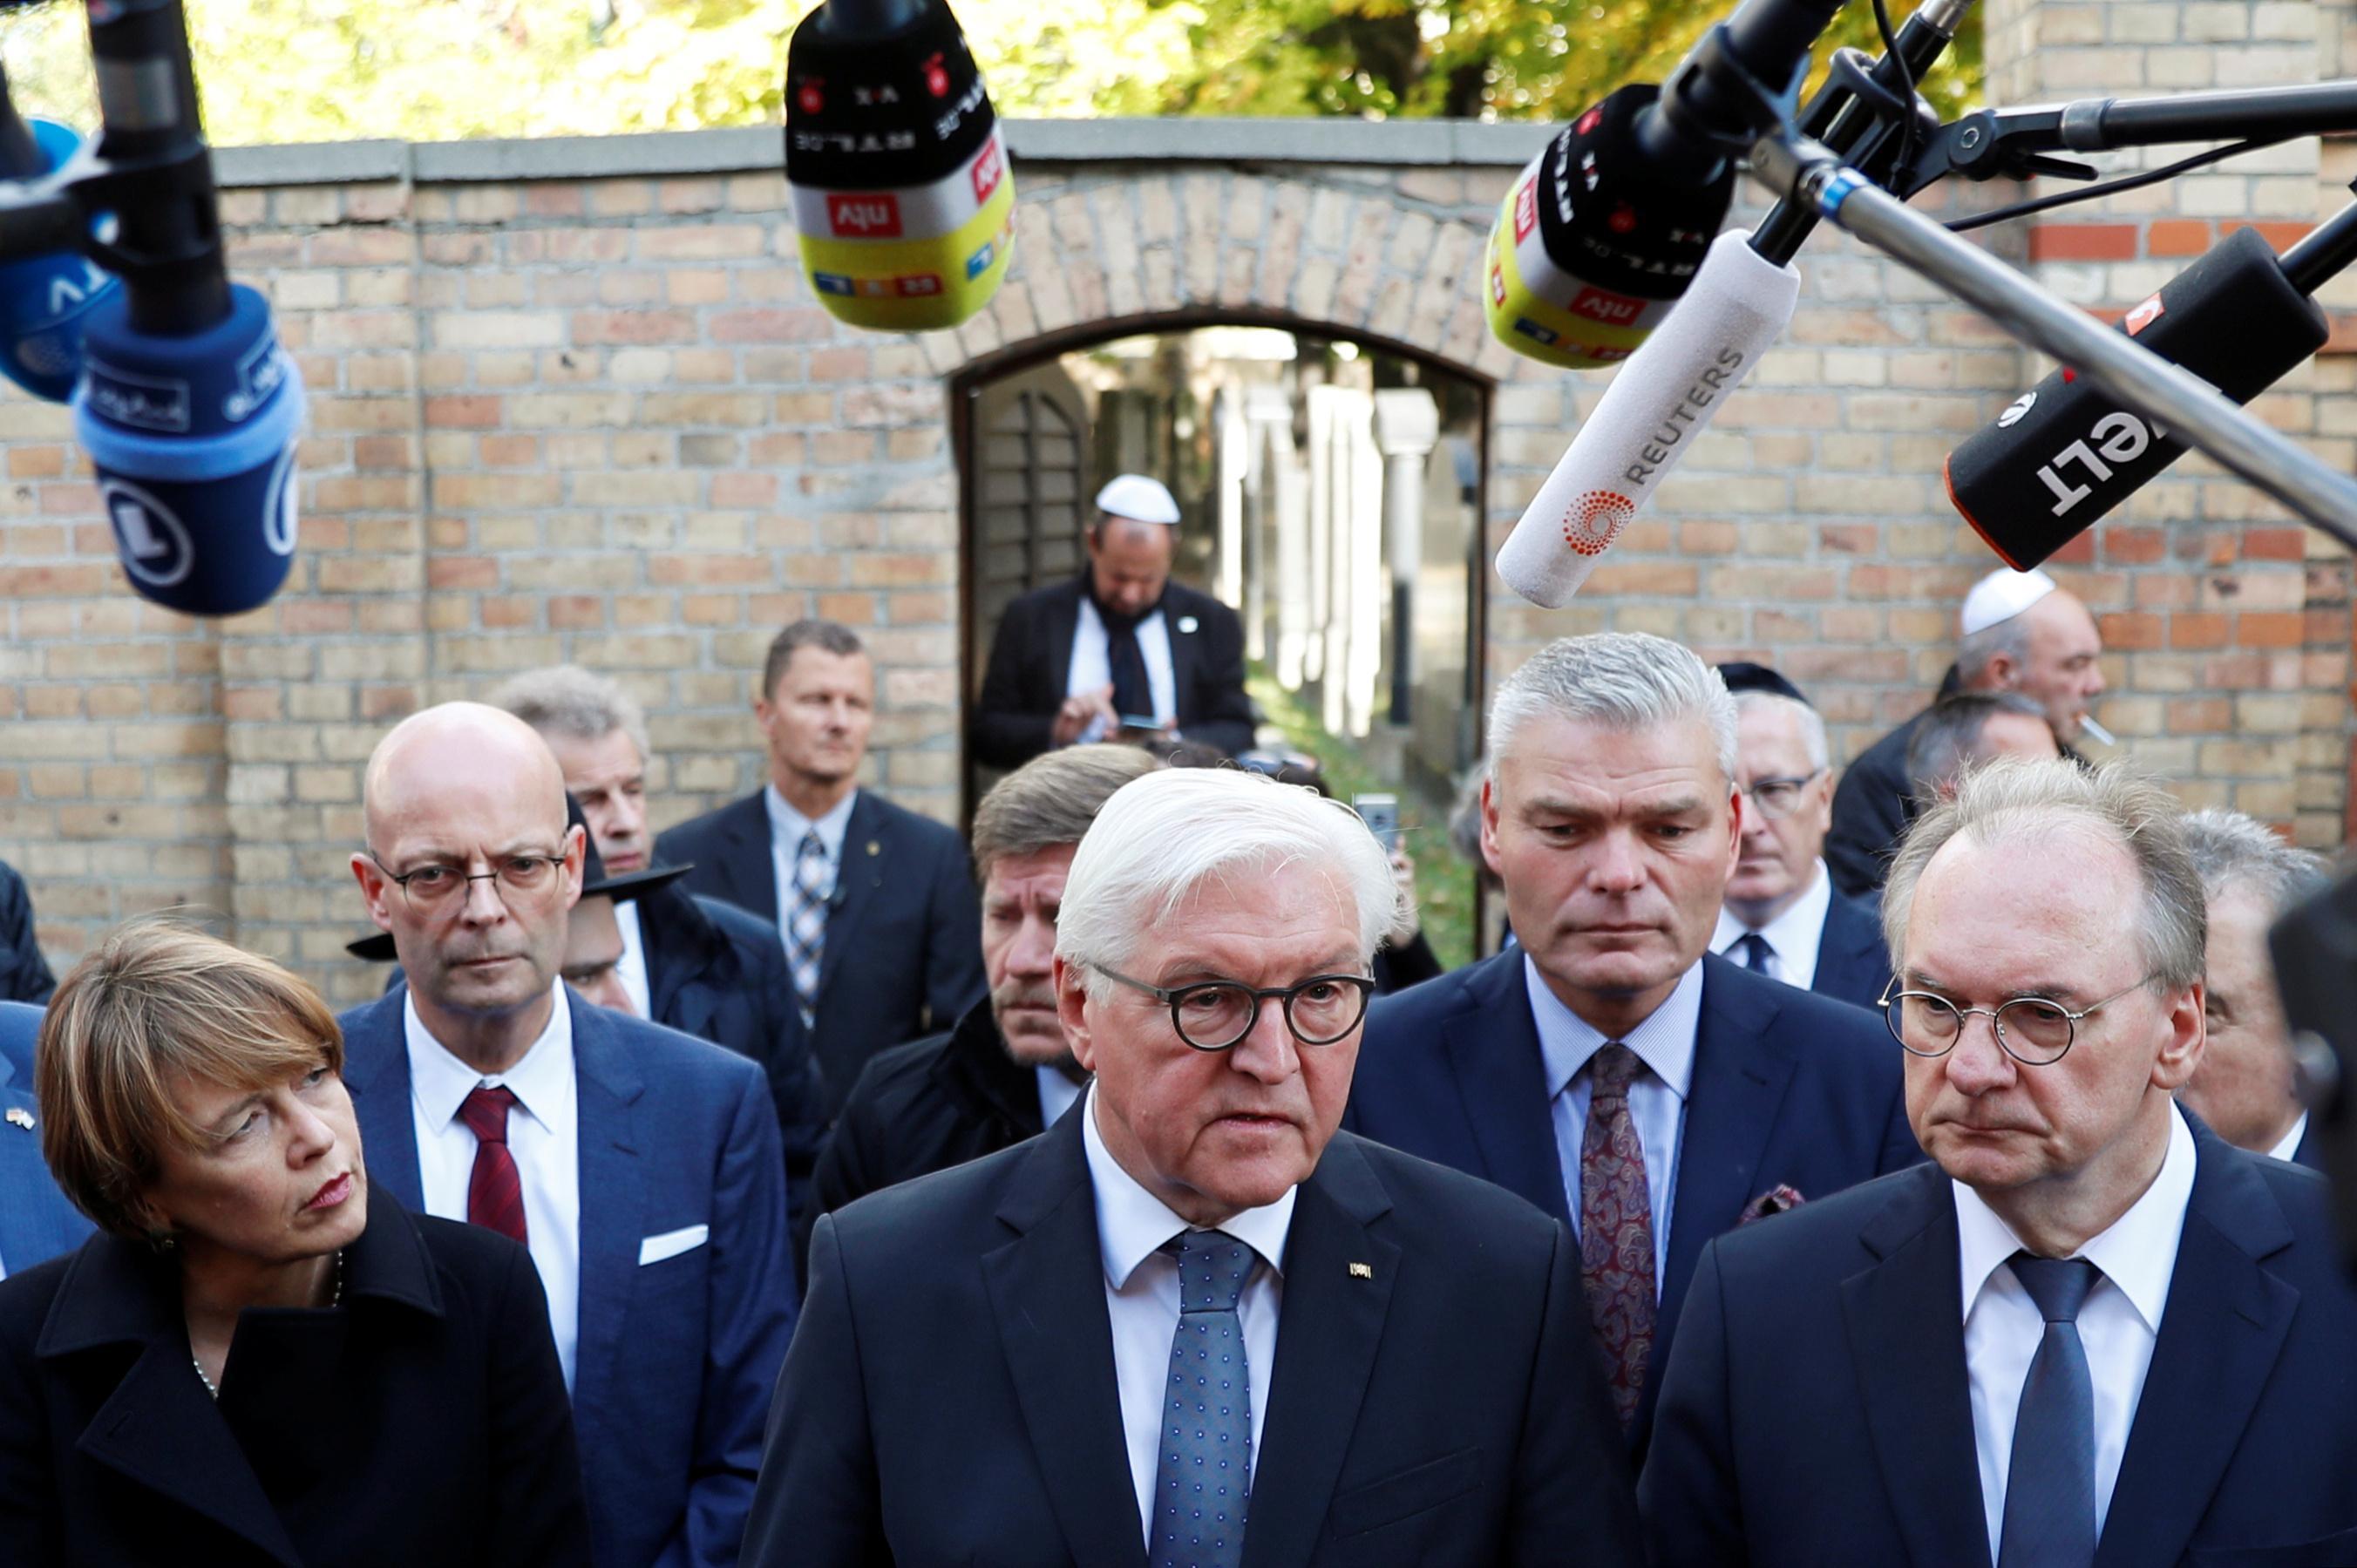 German synagogue gunman aimed to commit massacre, prosecutor says